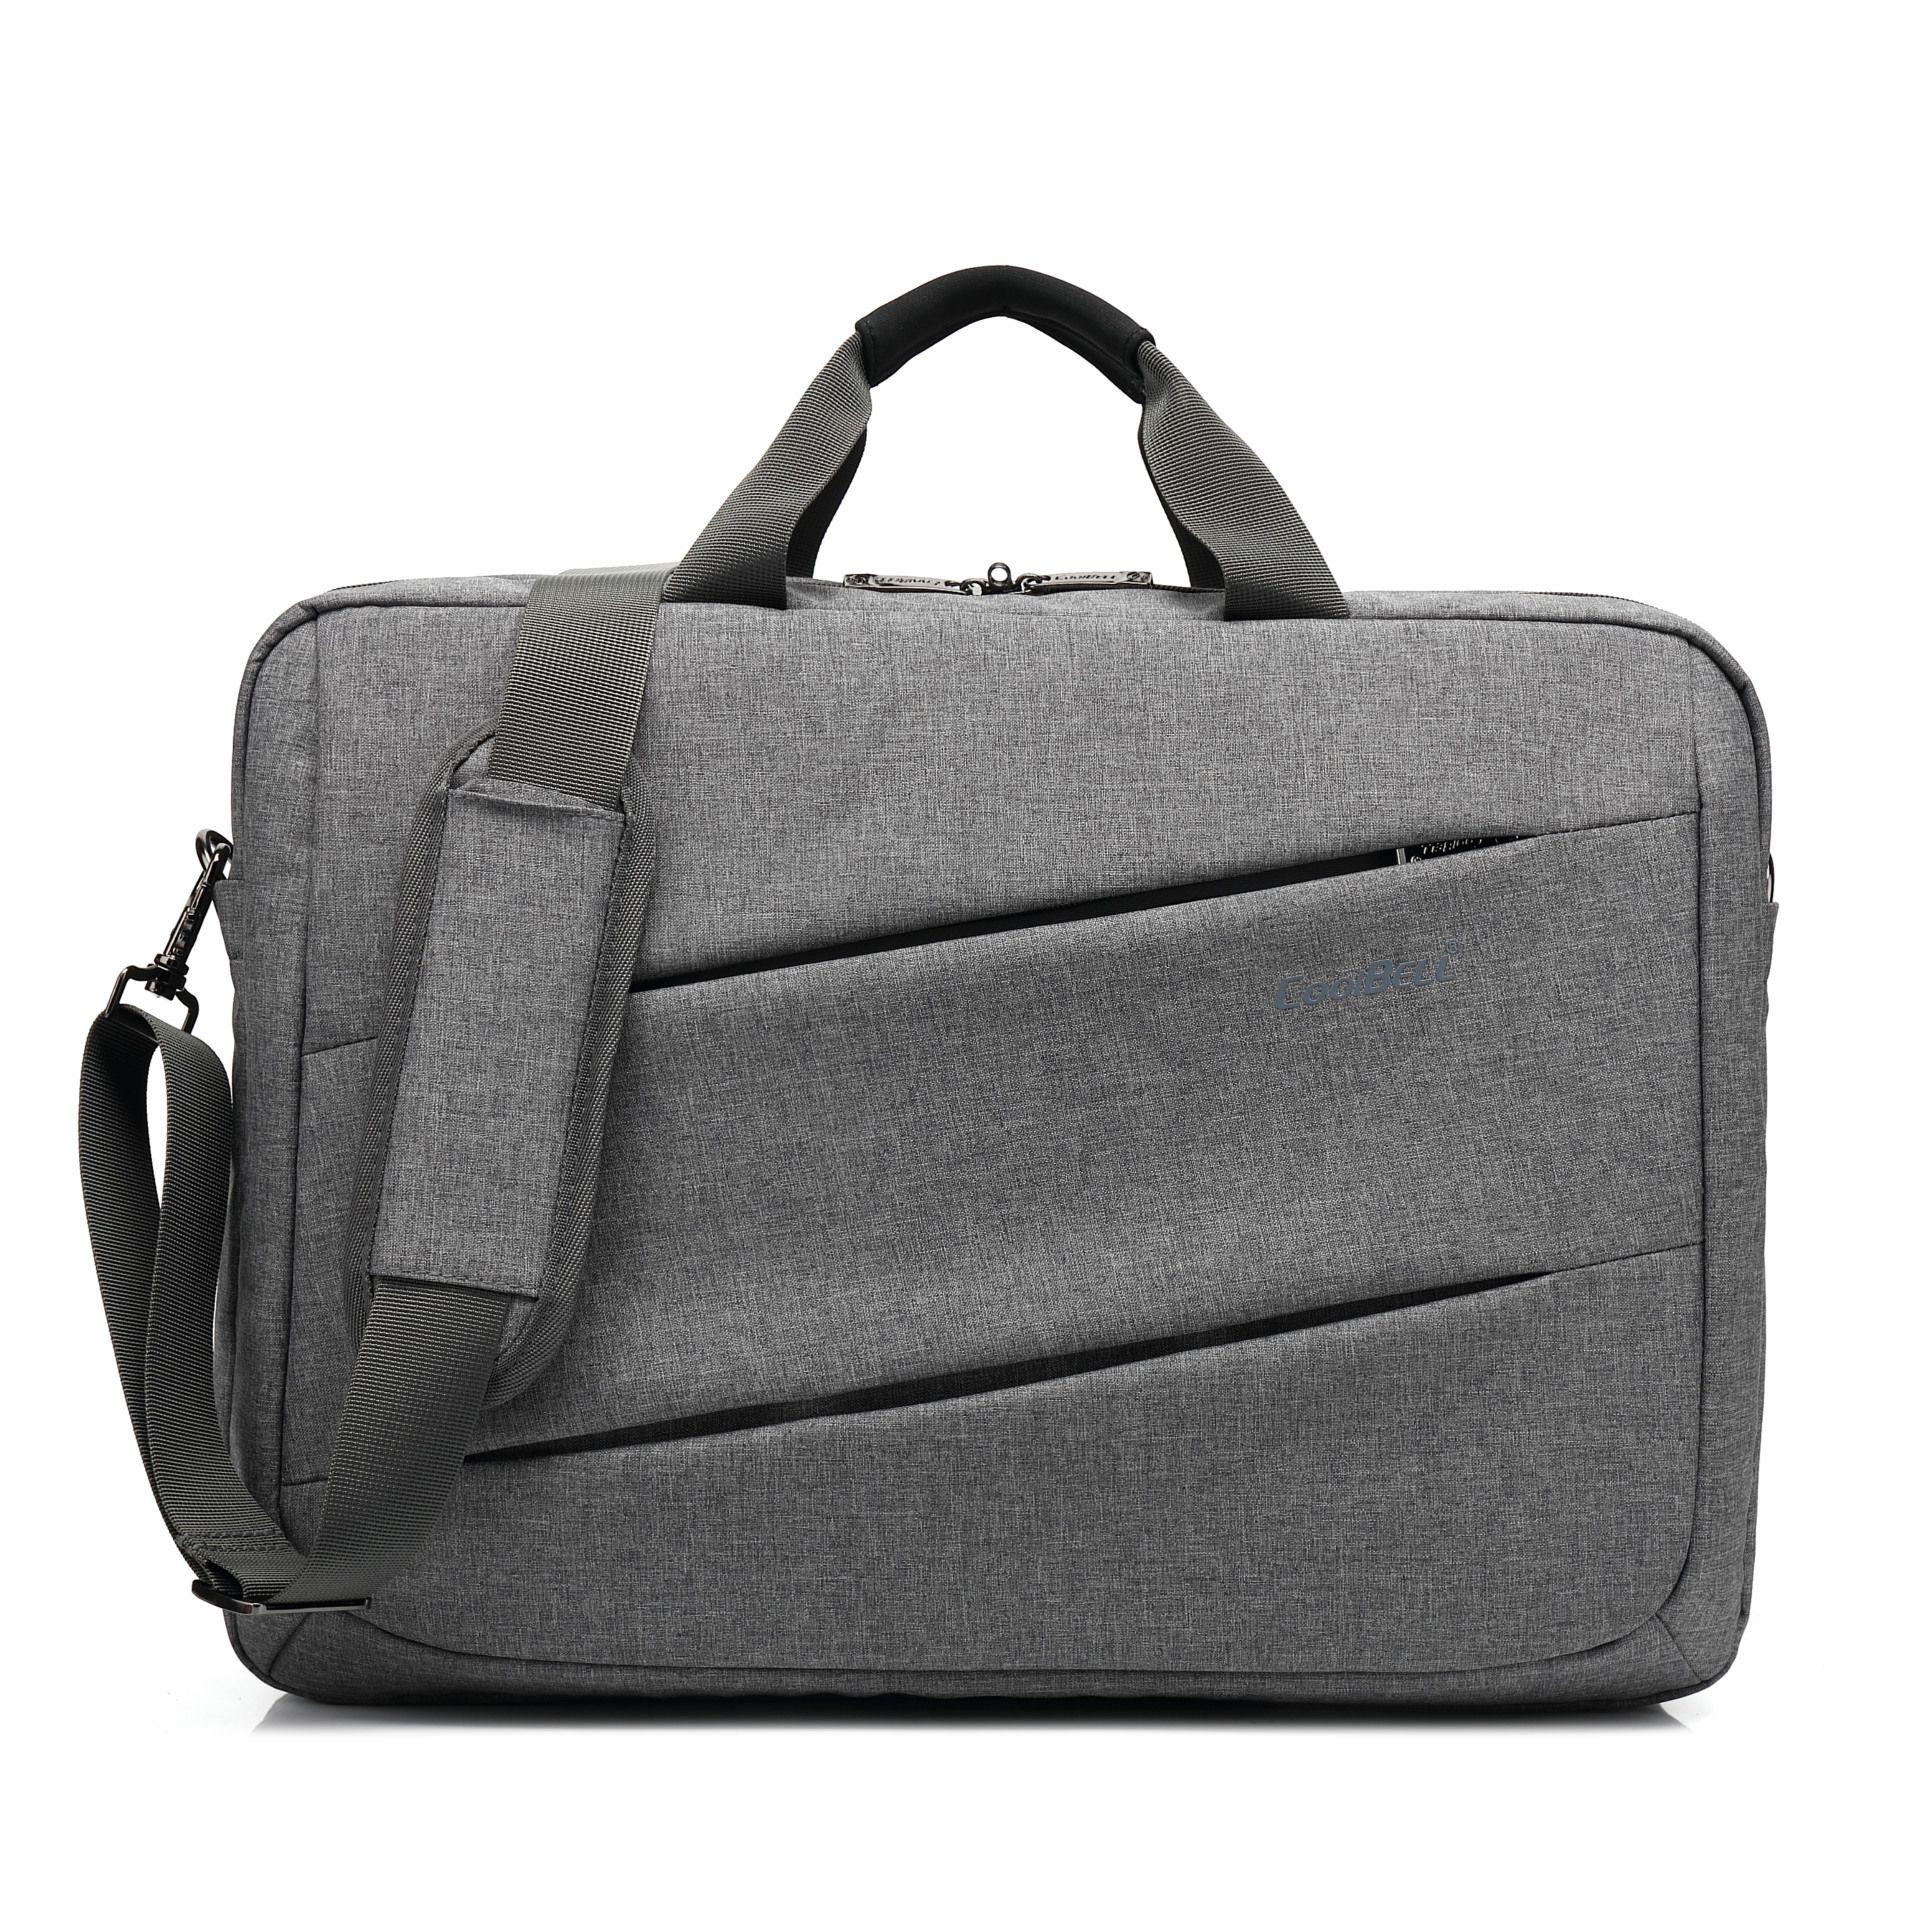 e1c3e65251 Mens Oxford Waterproof Business Briefcase Laptop Bag Shoulder Bags Cross  Body Bag Carry On Handle Case For Computer Notebook MacBook Satchels Leather  Purses ...